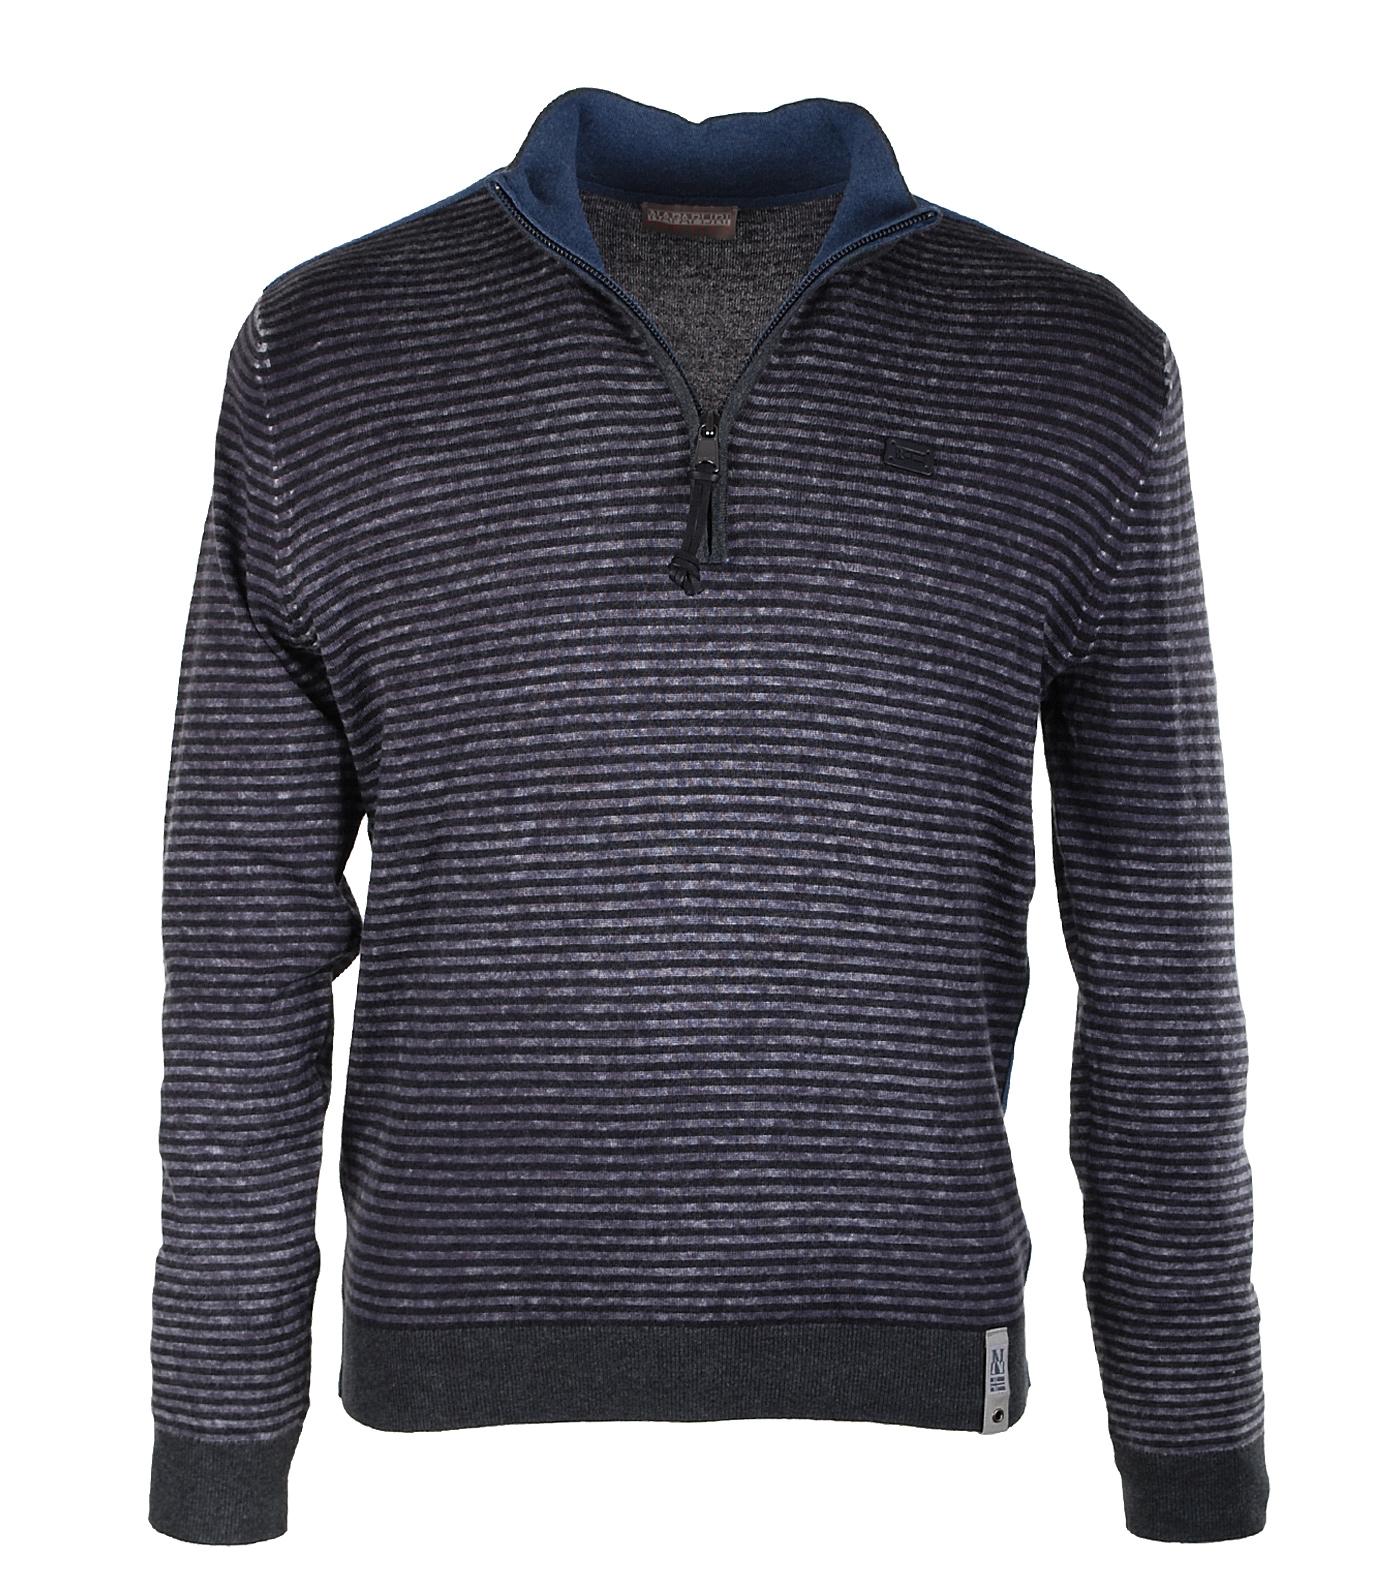 Napapijri trui zipper delawanna for Designhotel maastricht comfort xl